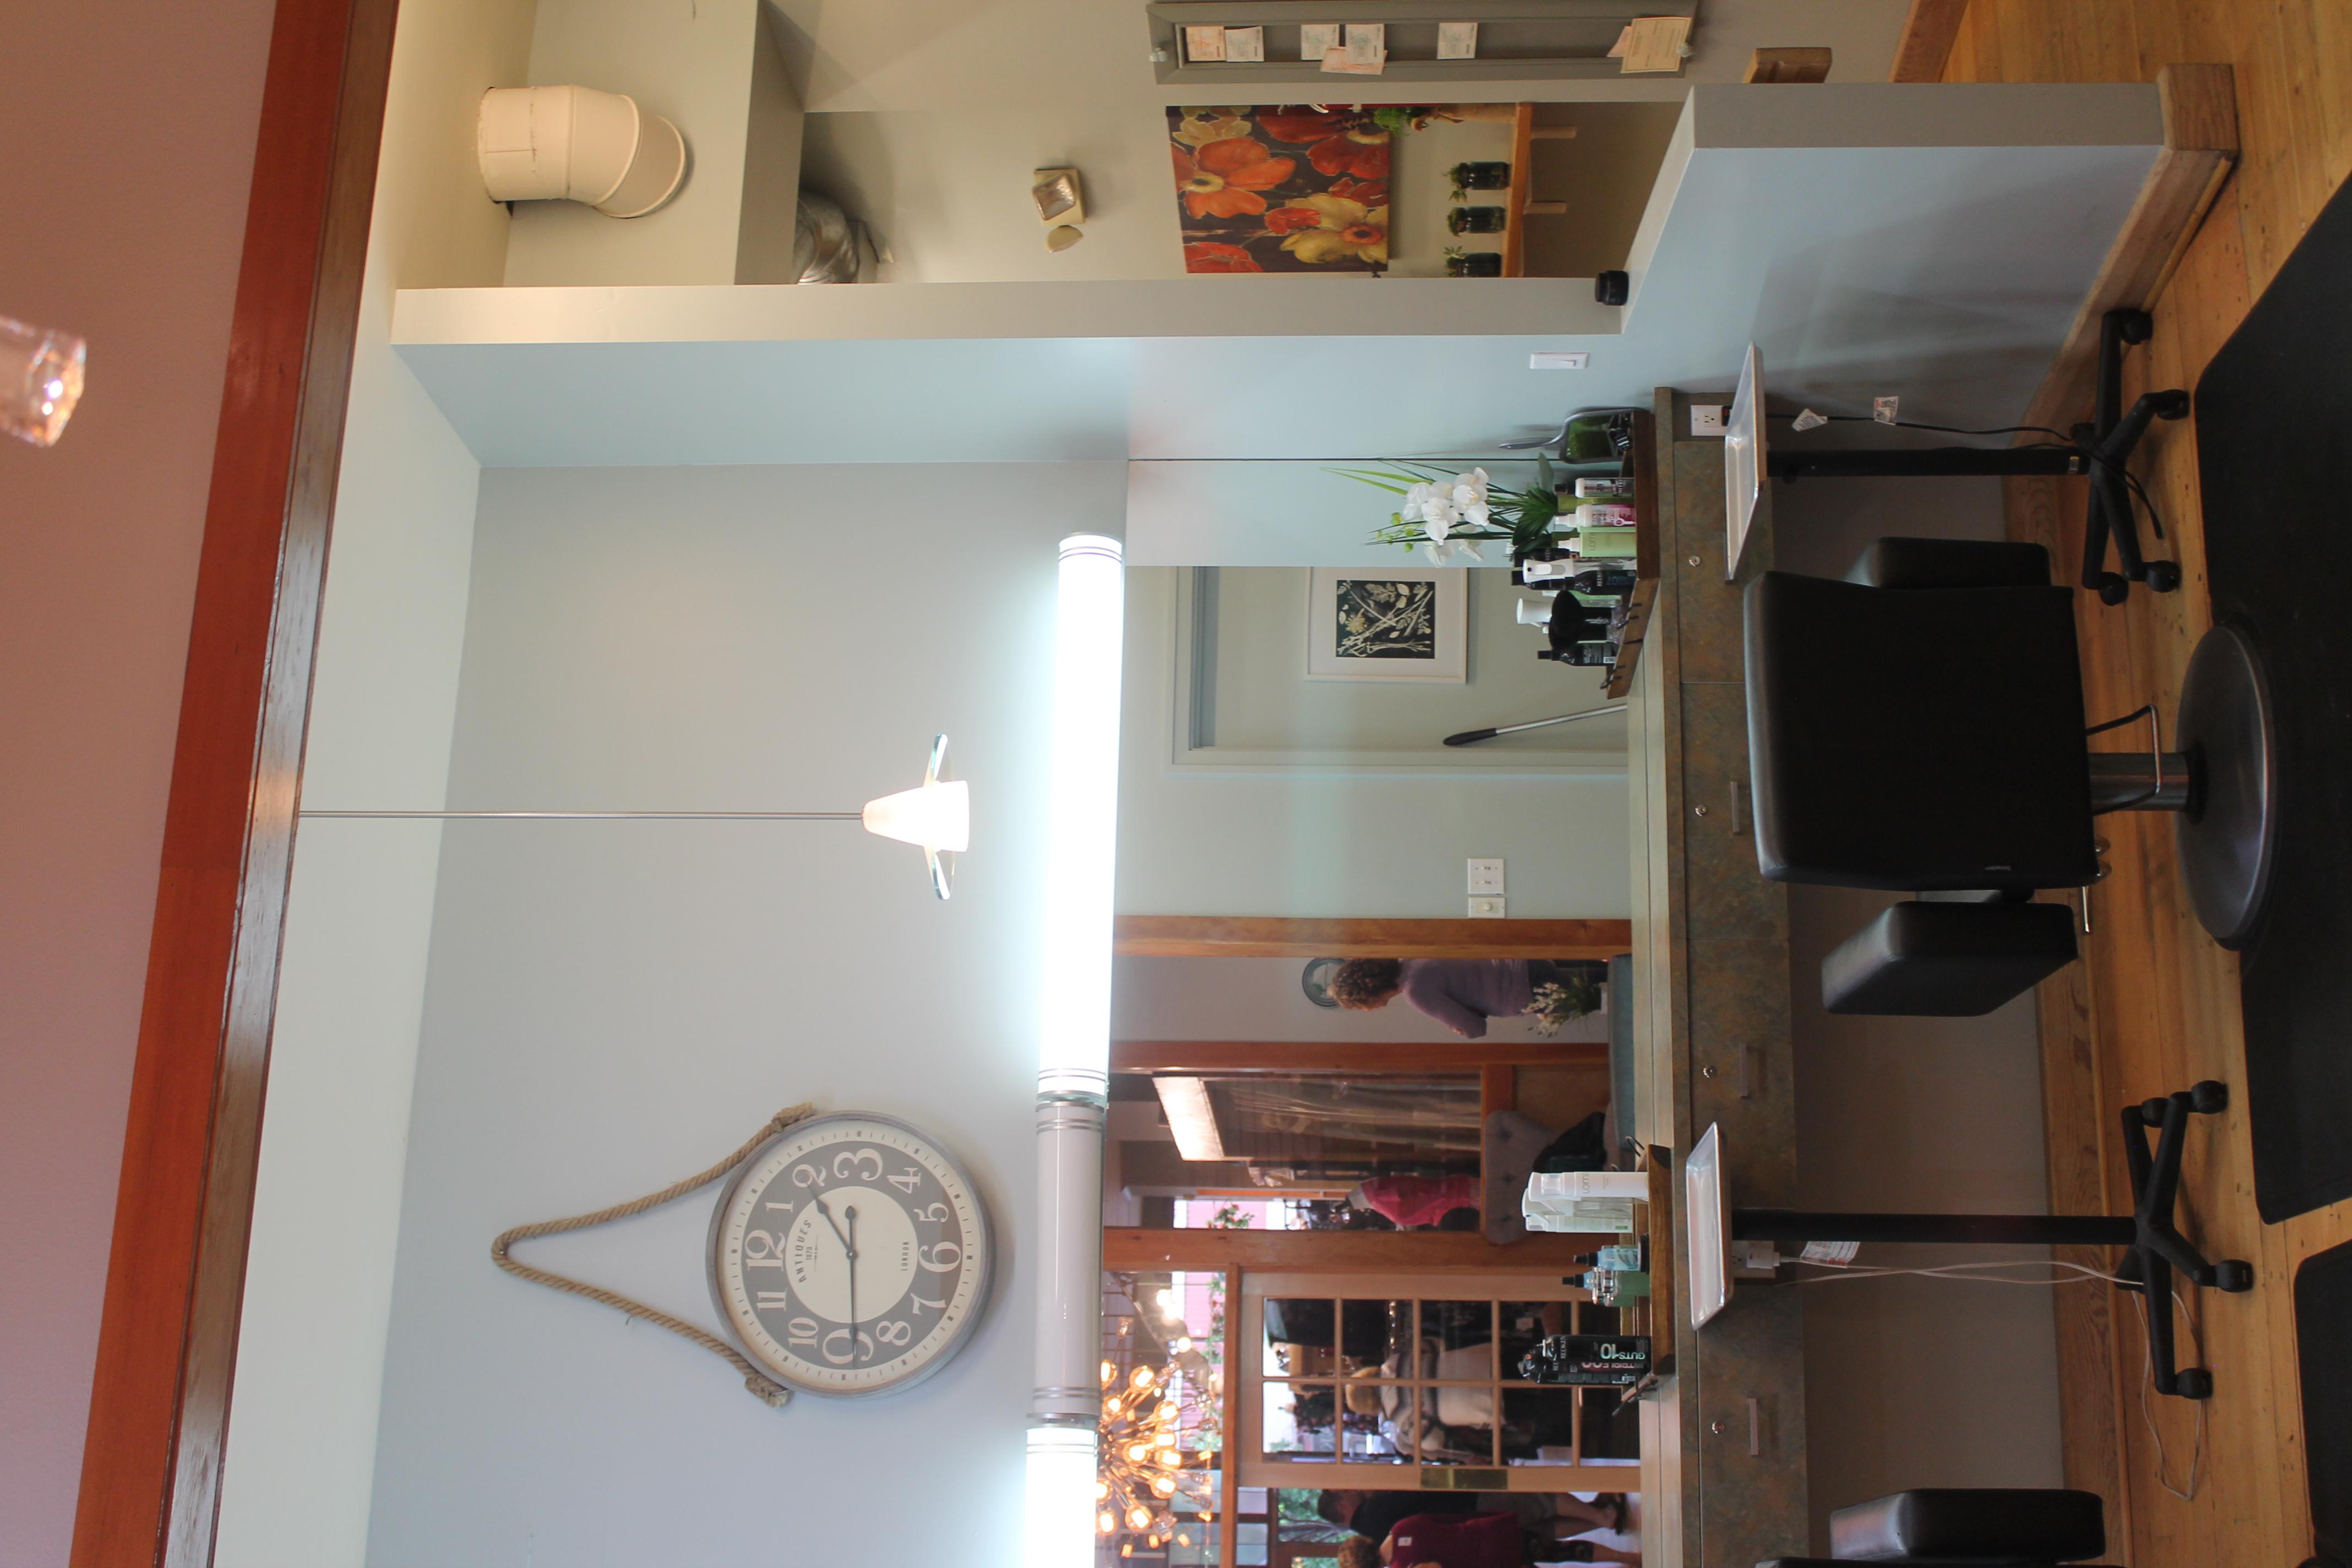 Premier Salon and Stylists